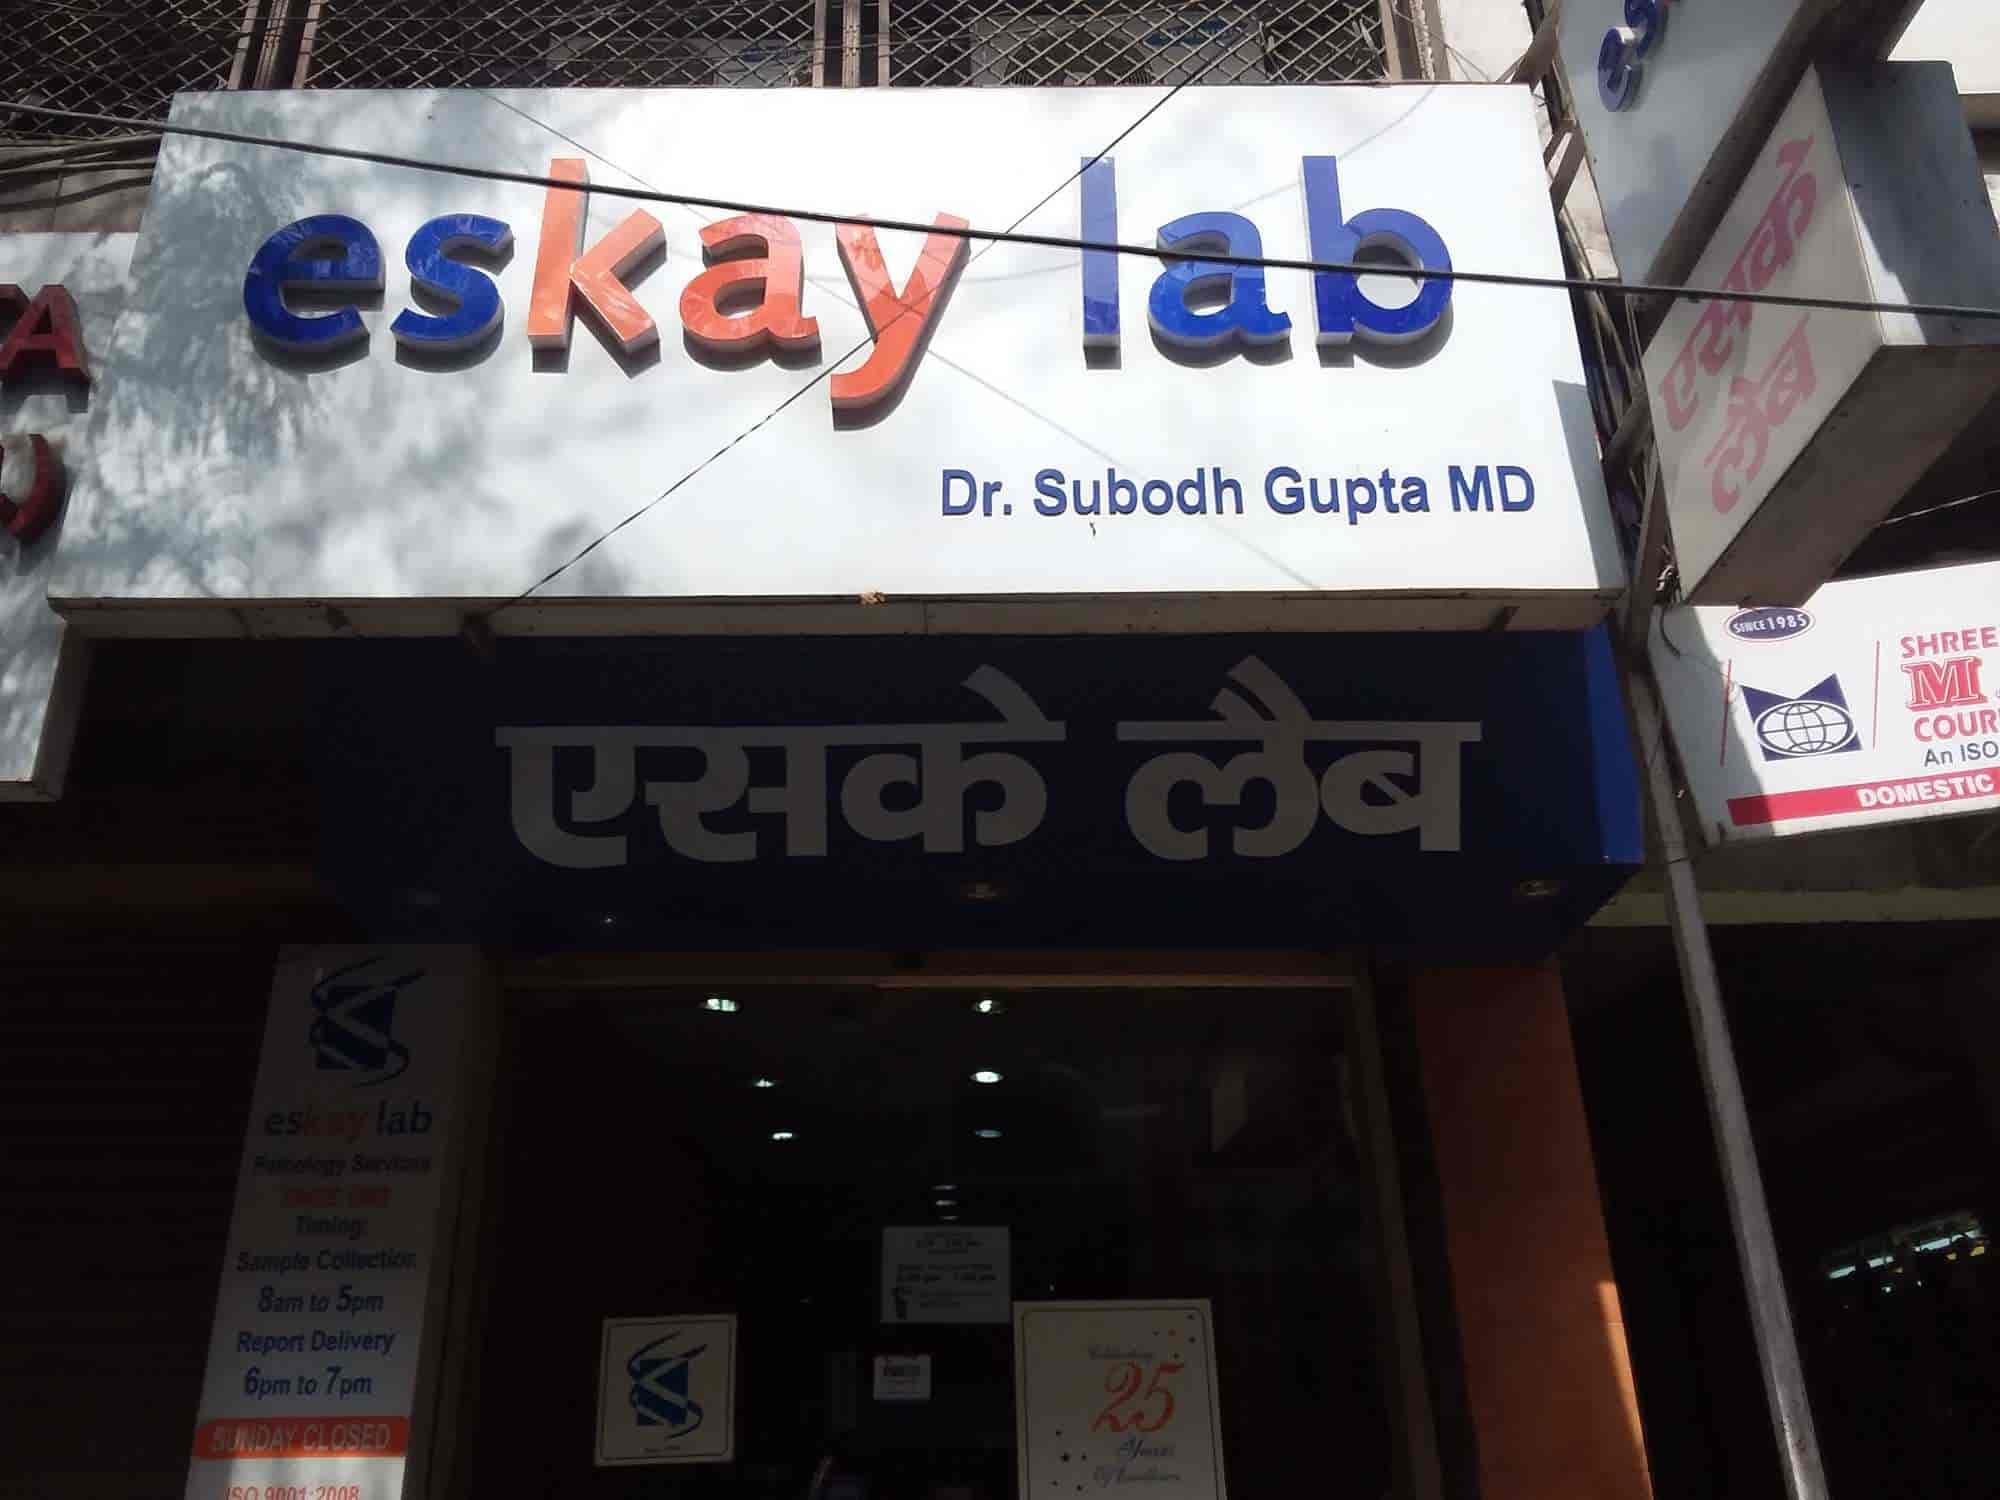 Eskay Lab Mayur Vihar Phase 1 S K Pathology Labs In Delhi Patient Monitor Esskay Institute Justdial